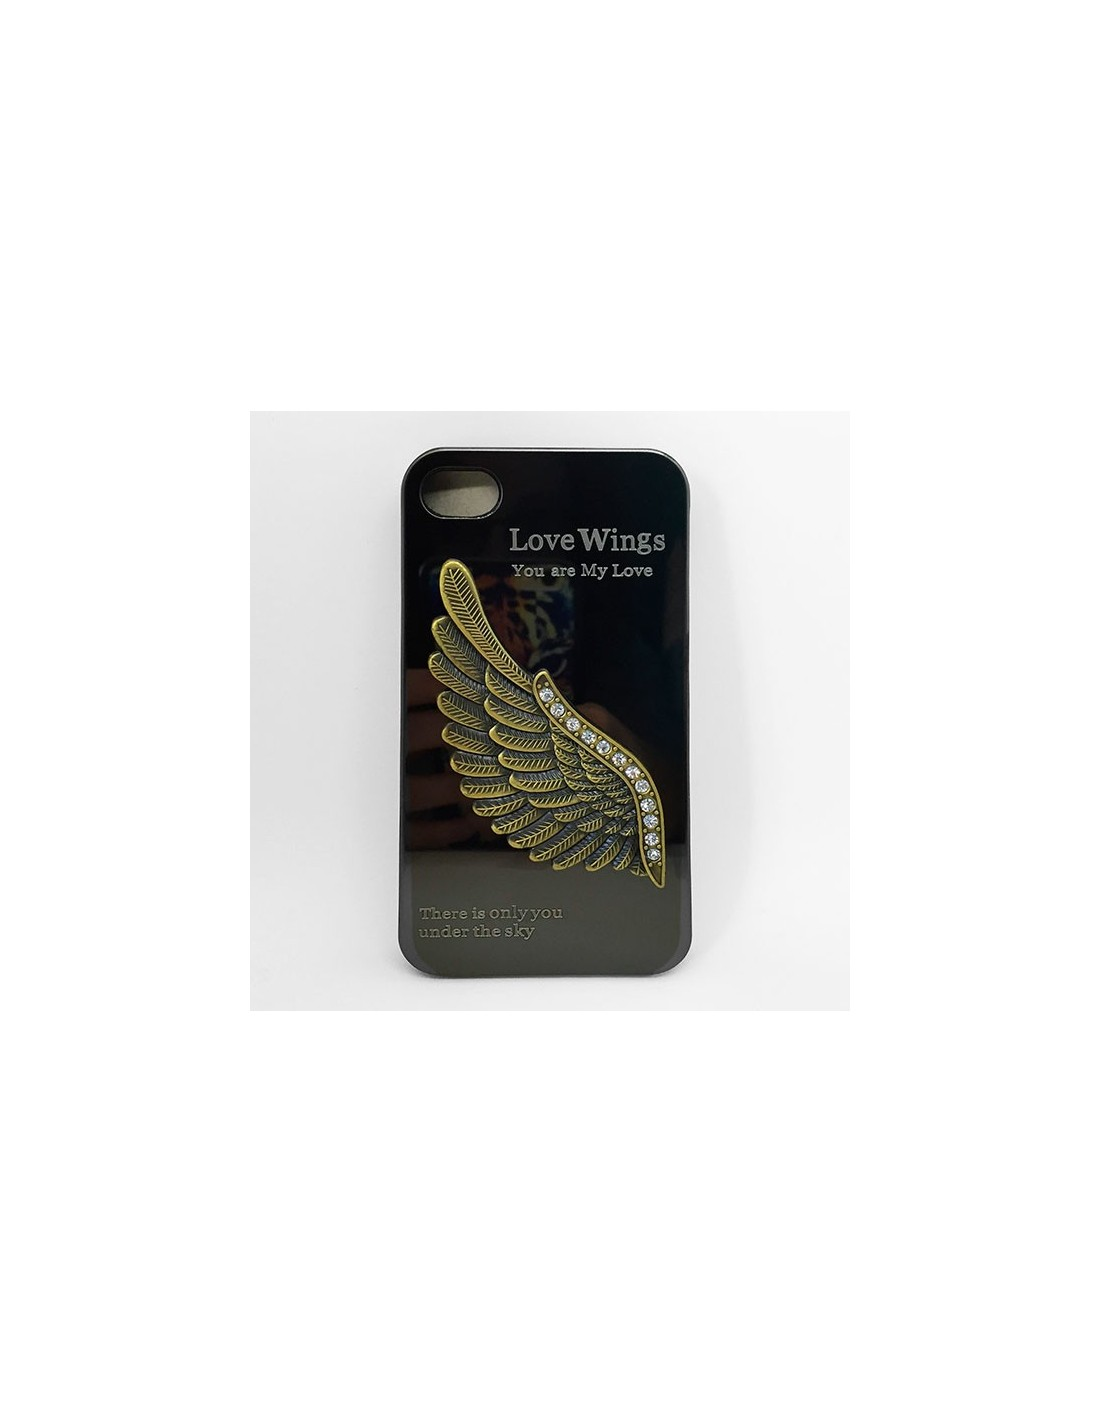 coque ailes d 39 ange strass miroir pour iphone 4 4s. Black Bedroom Furniture Sets. Home Design Ideas